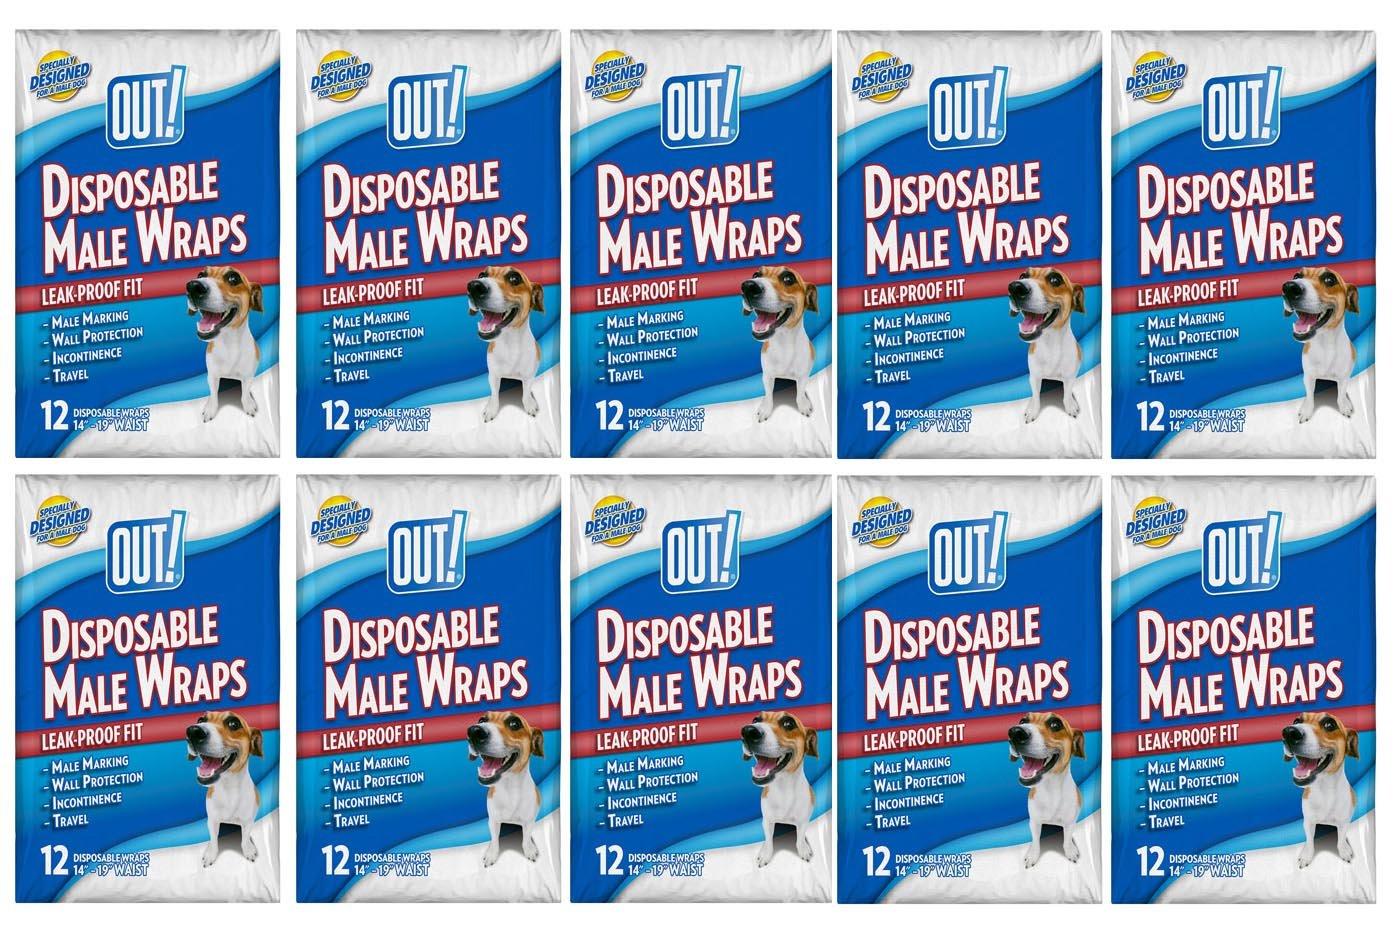 OUT! 12 Count Disposable Male Wraps, Medium - 12 Packs! (Medium)